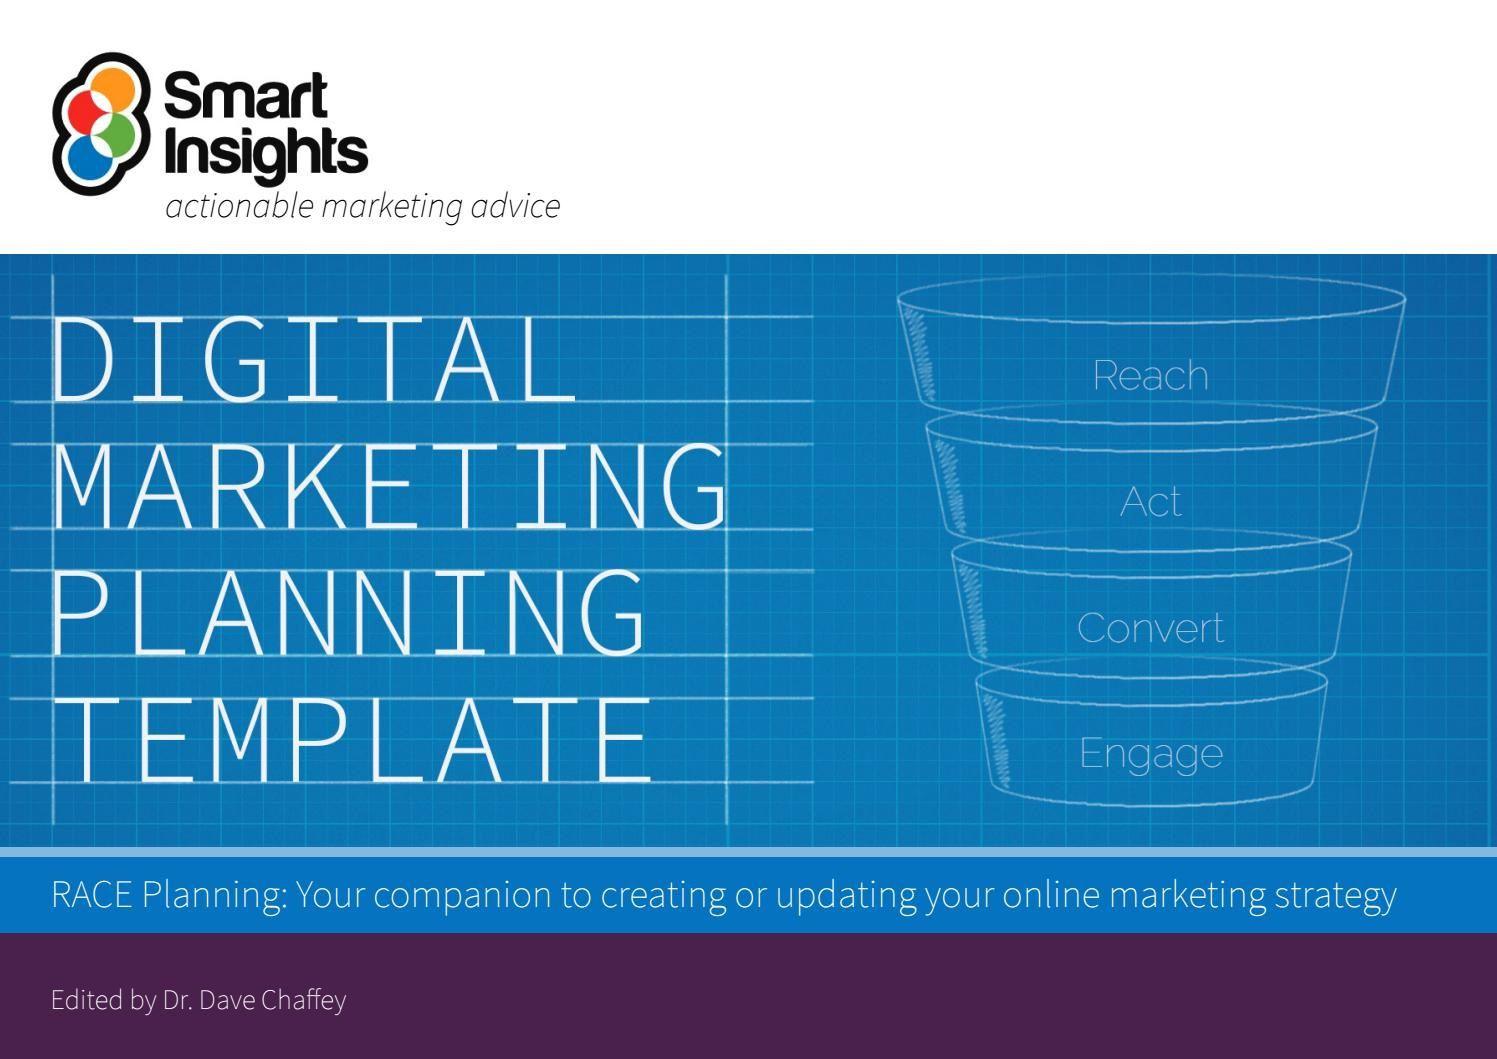 010 Fascinating Digital Marketing Plan Example Doc High Definition  Template SampleFull